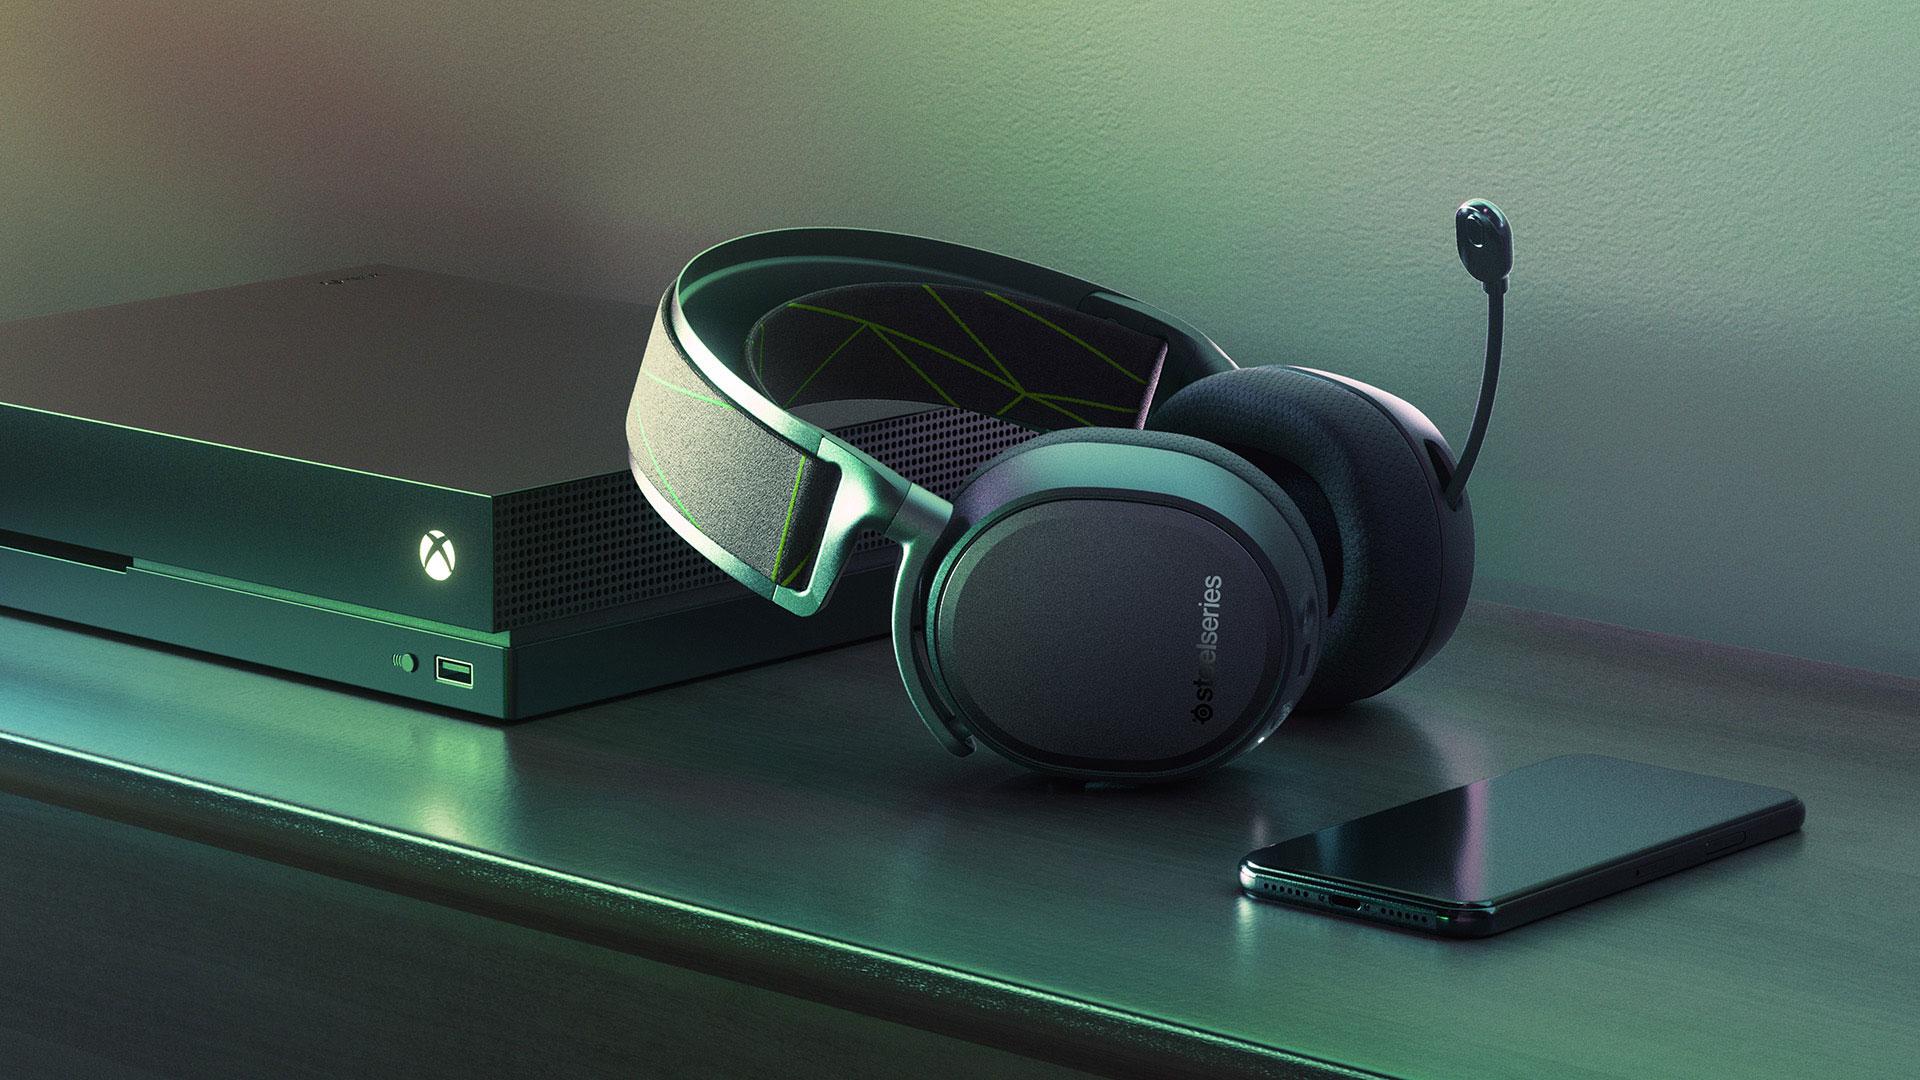 Sluchátka SteelSeries Arctis 9X pro Xbox One míří na trh